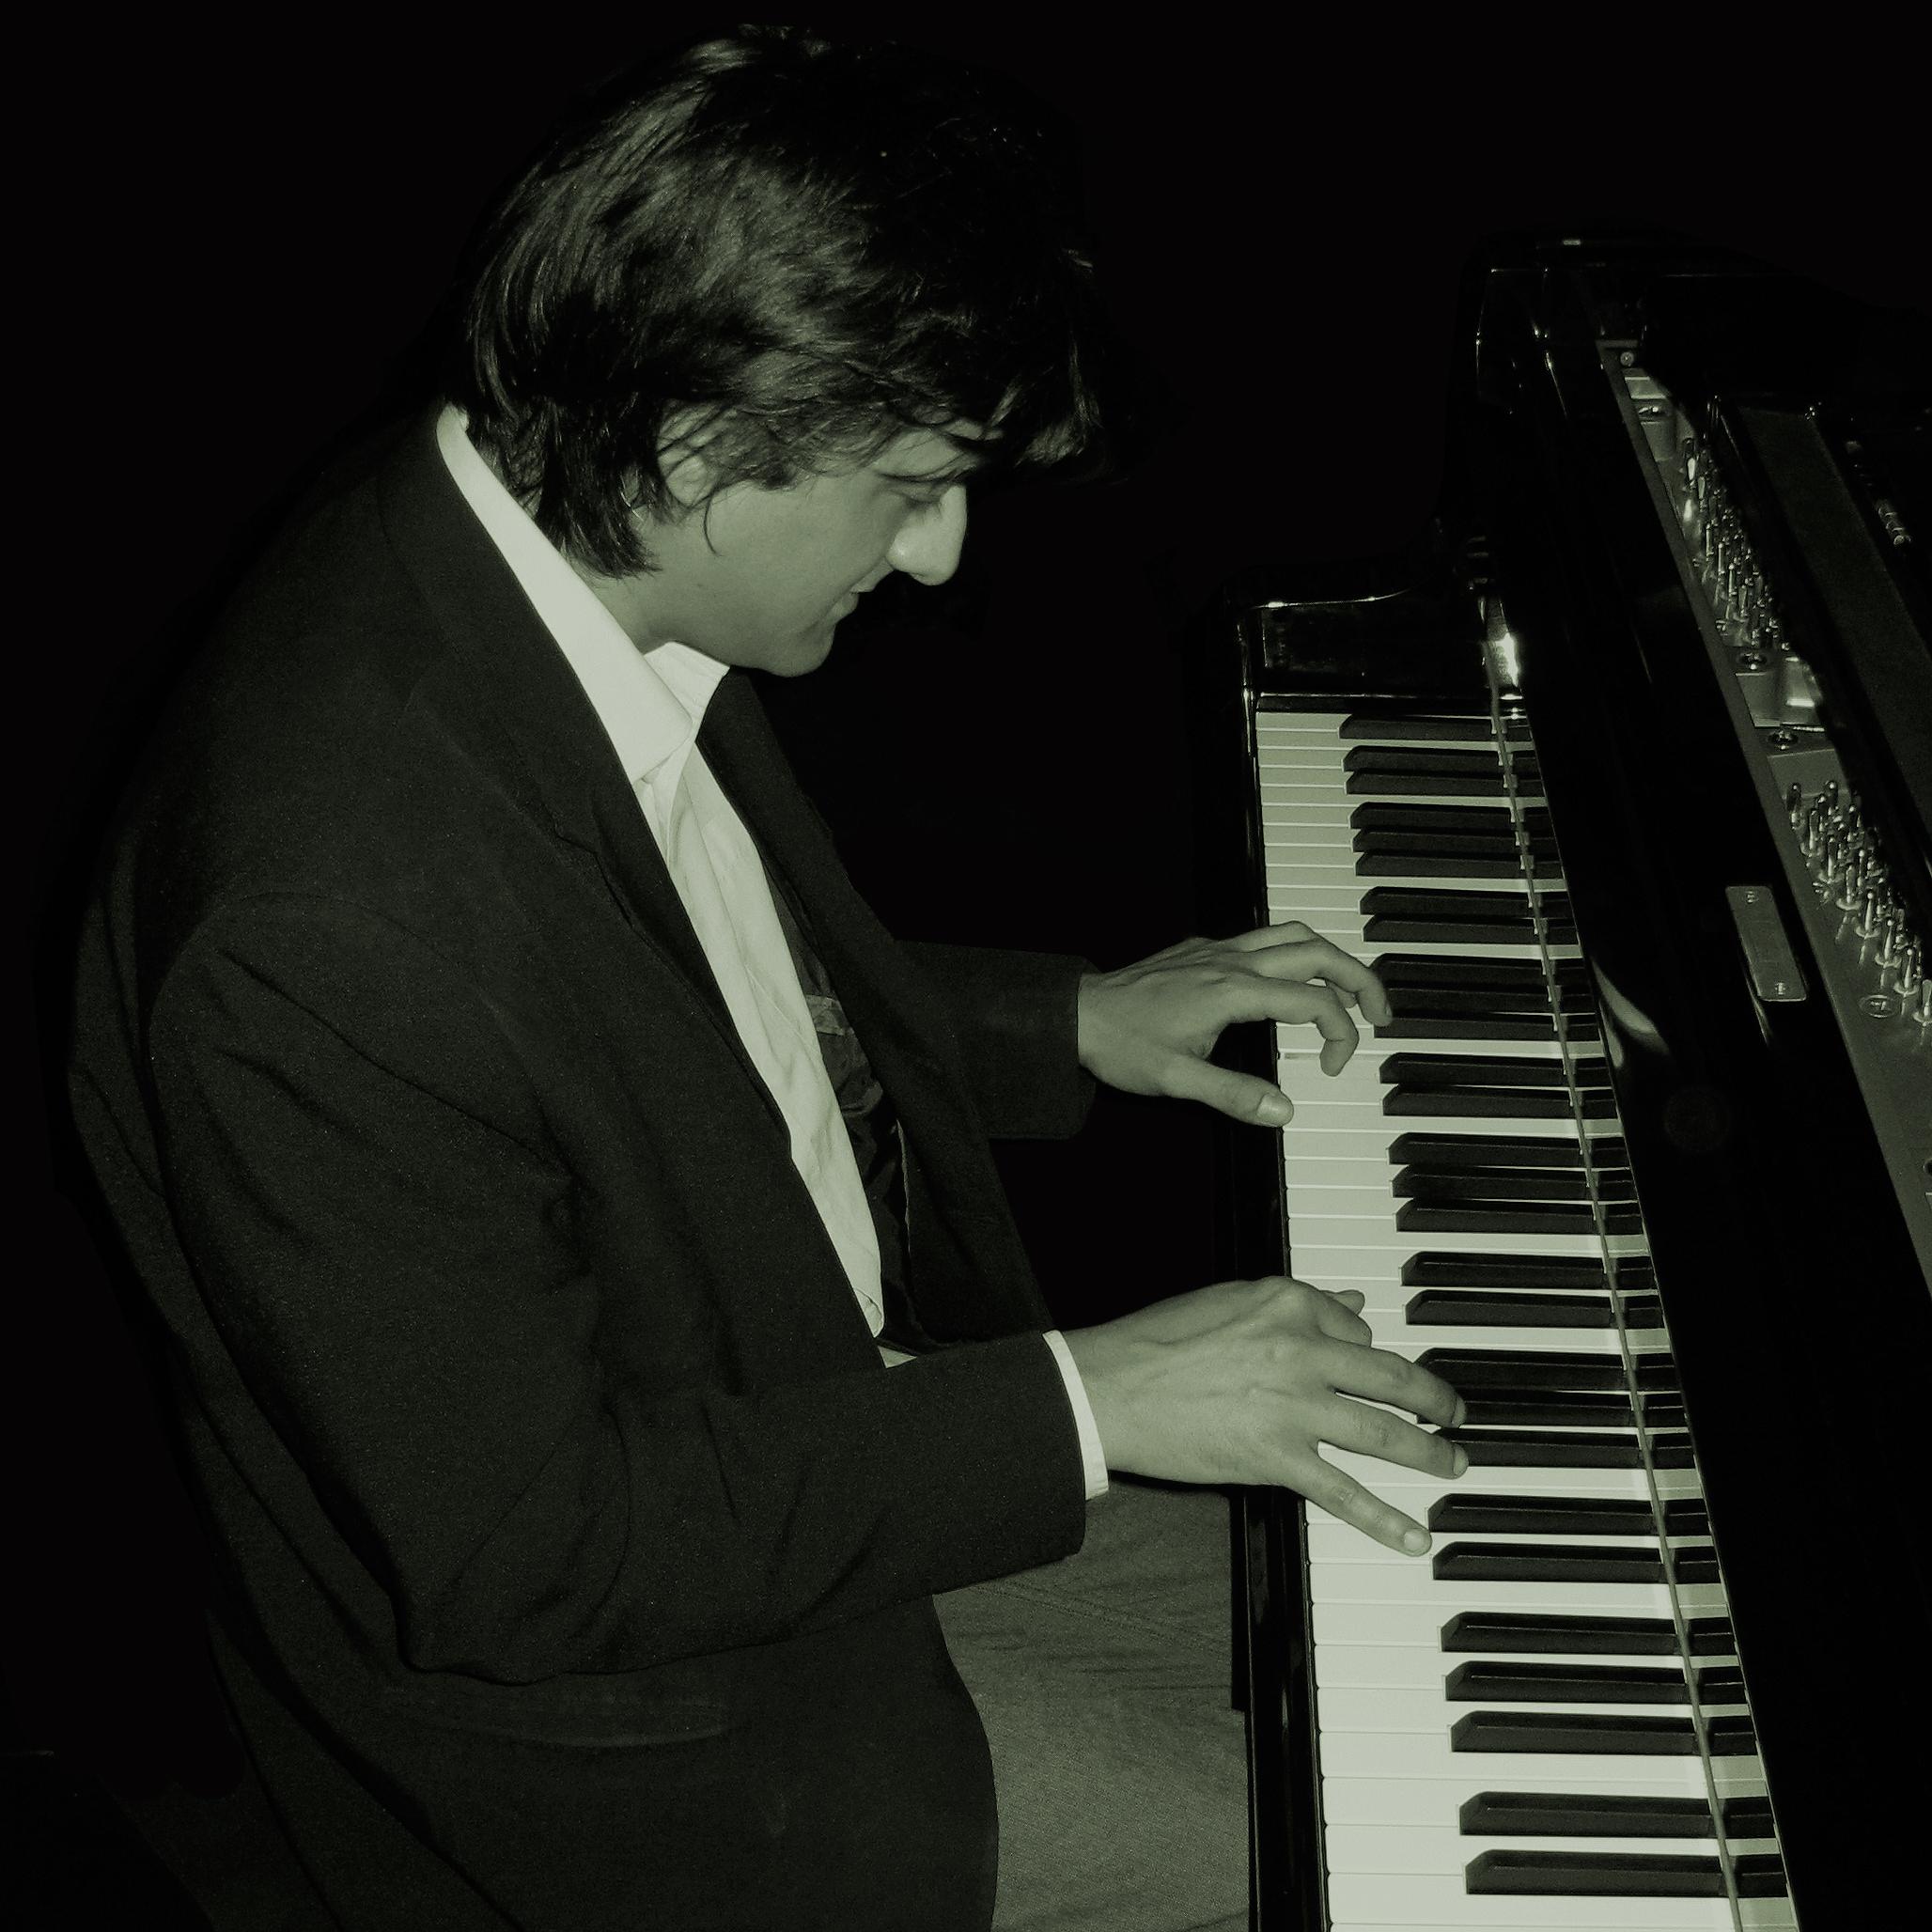 http://www.jazzinreading.com/jazz-gigs-reading-berkshire/Leon-G-pic.jpg